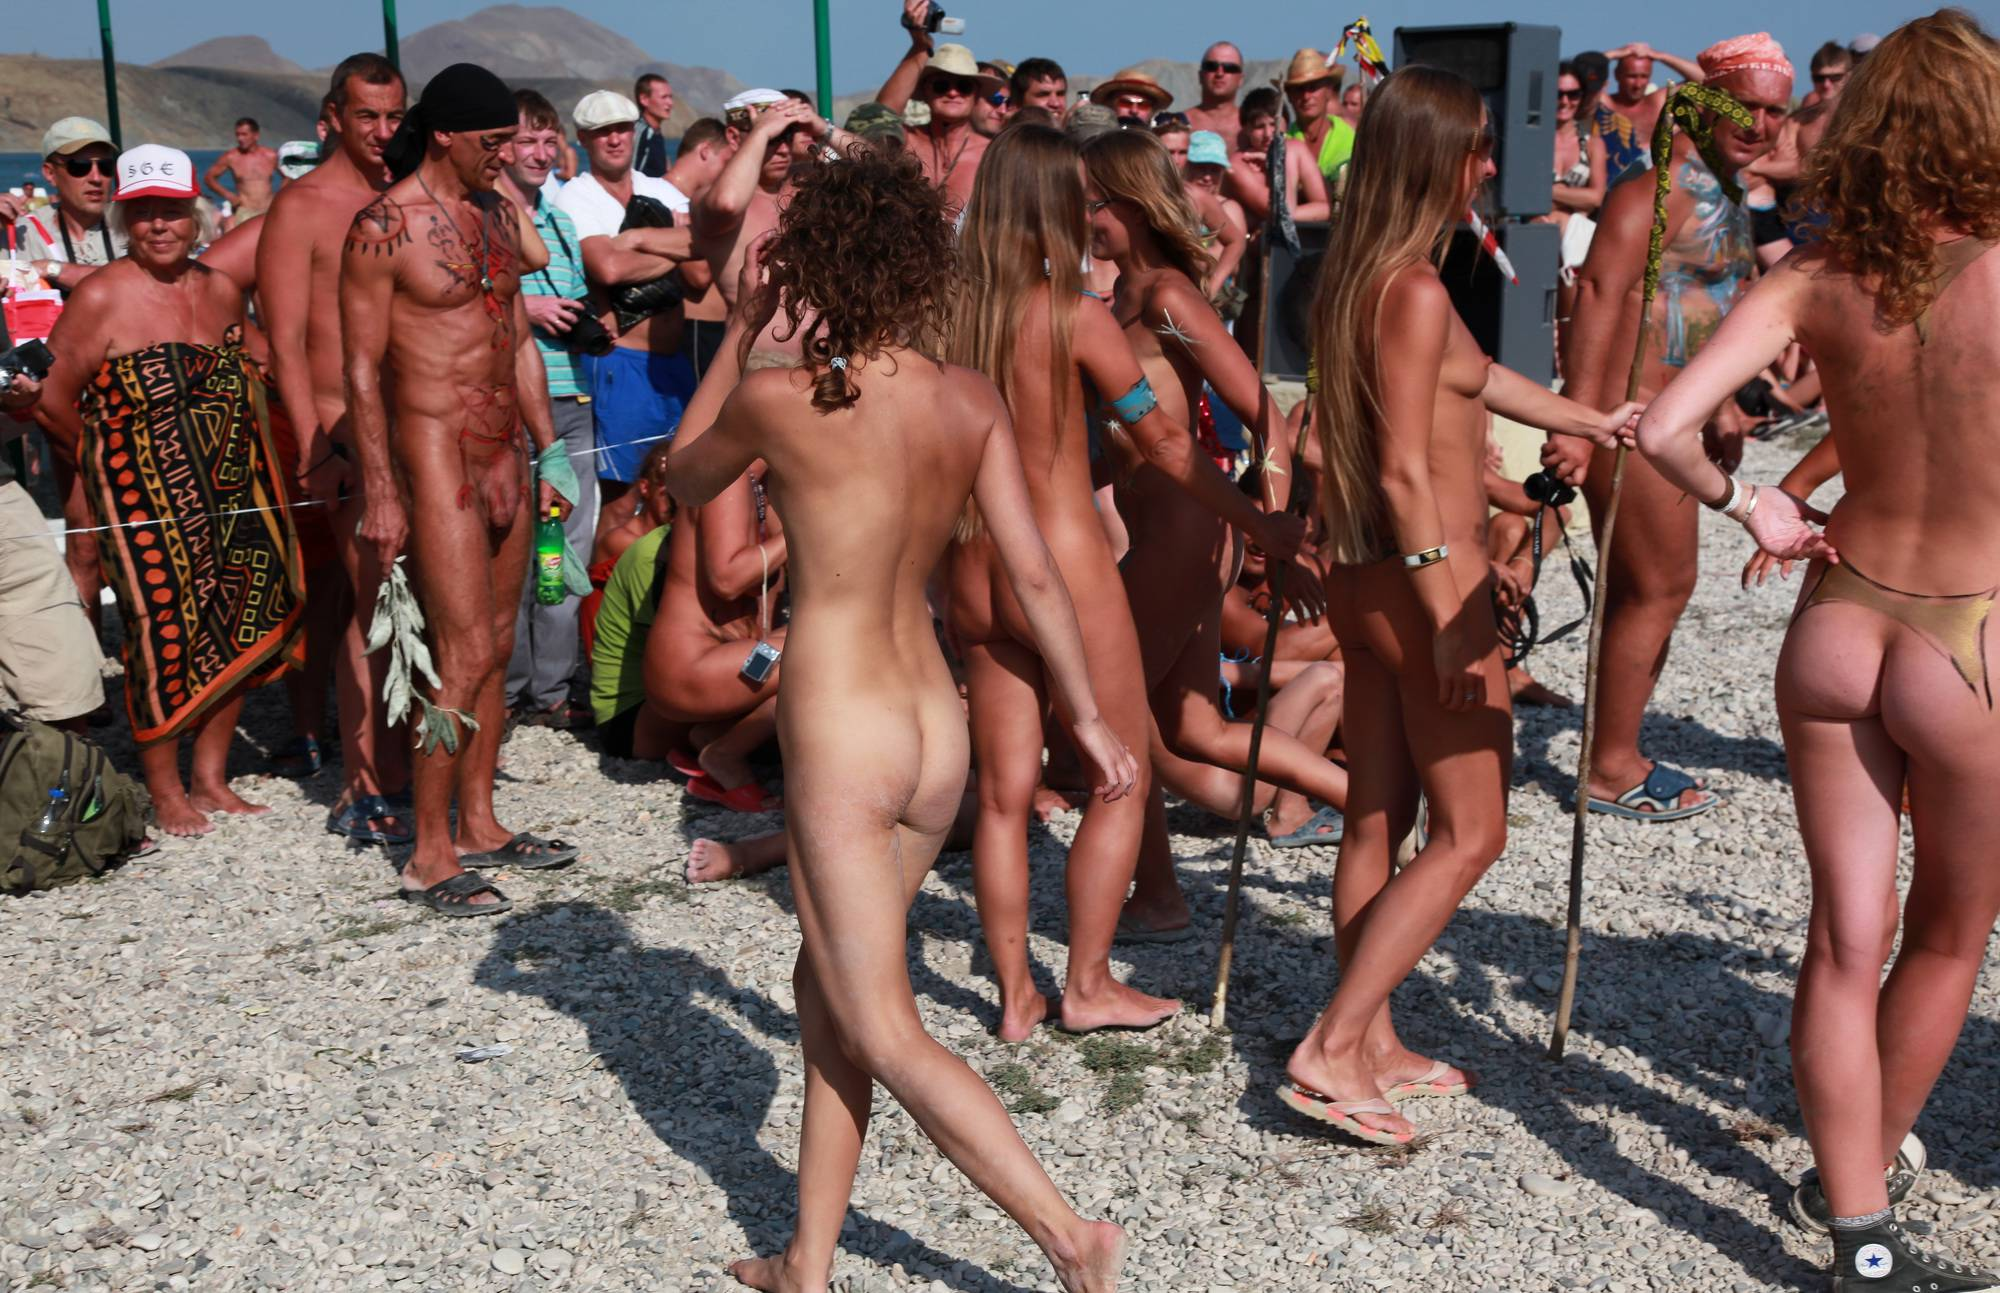 Nudist Pictures Neptune Bodypaint Lineup - 1